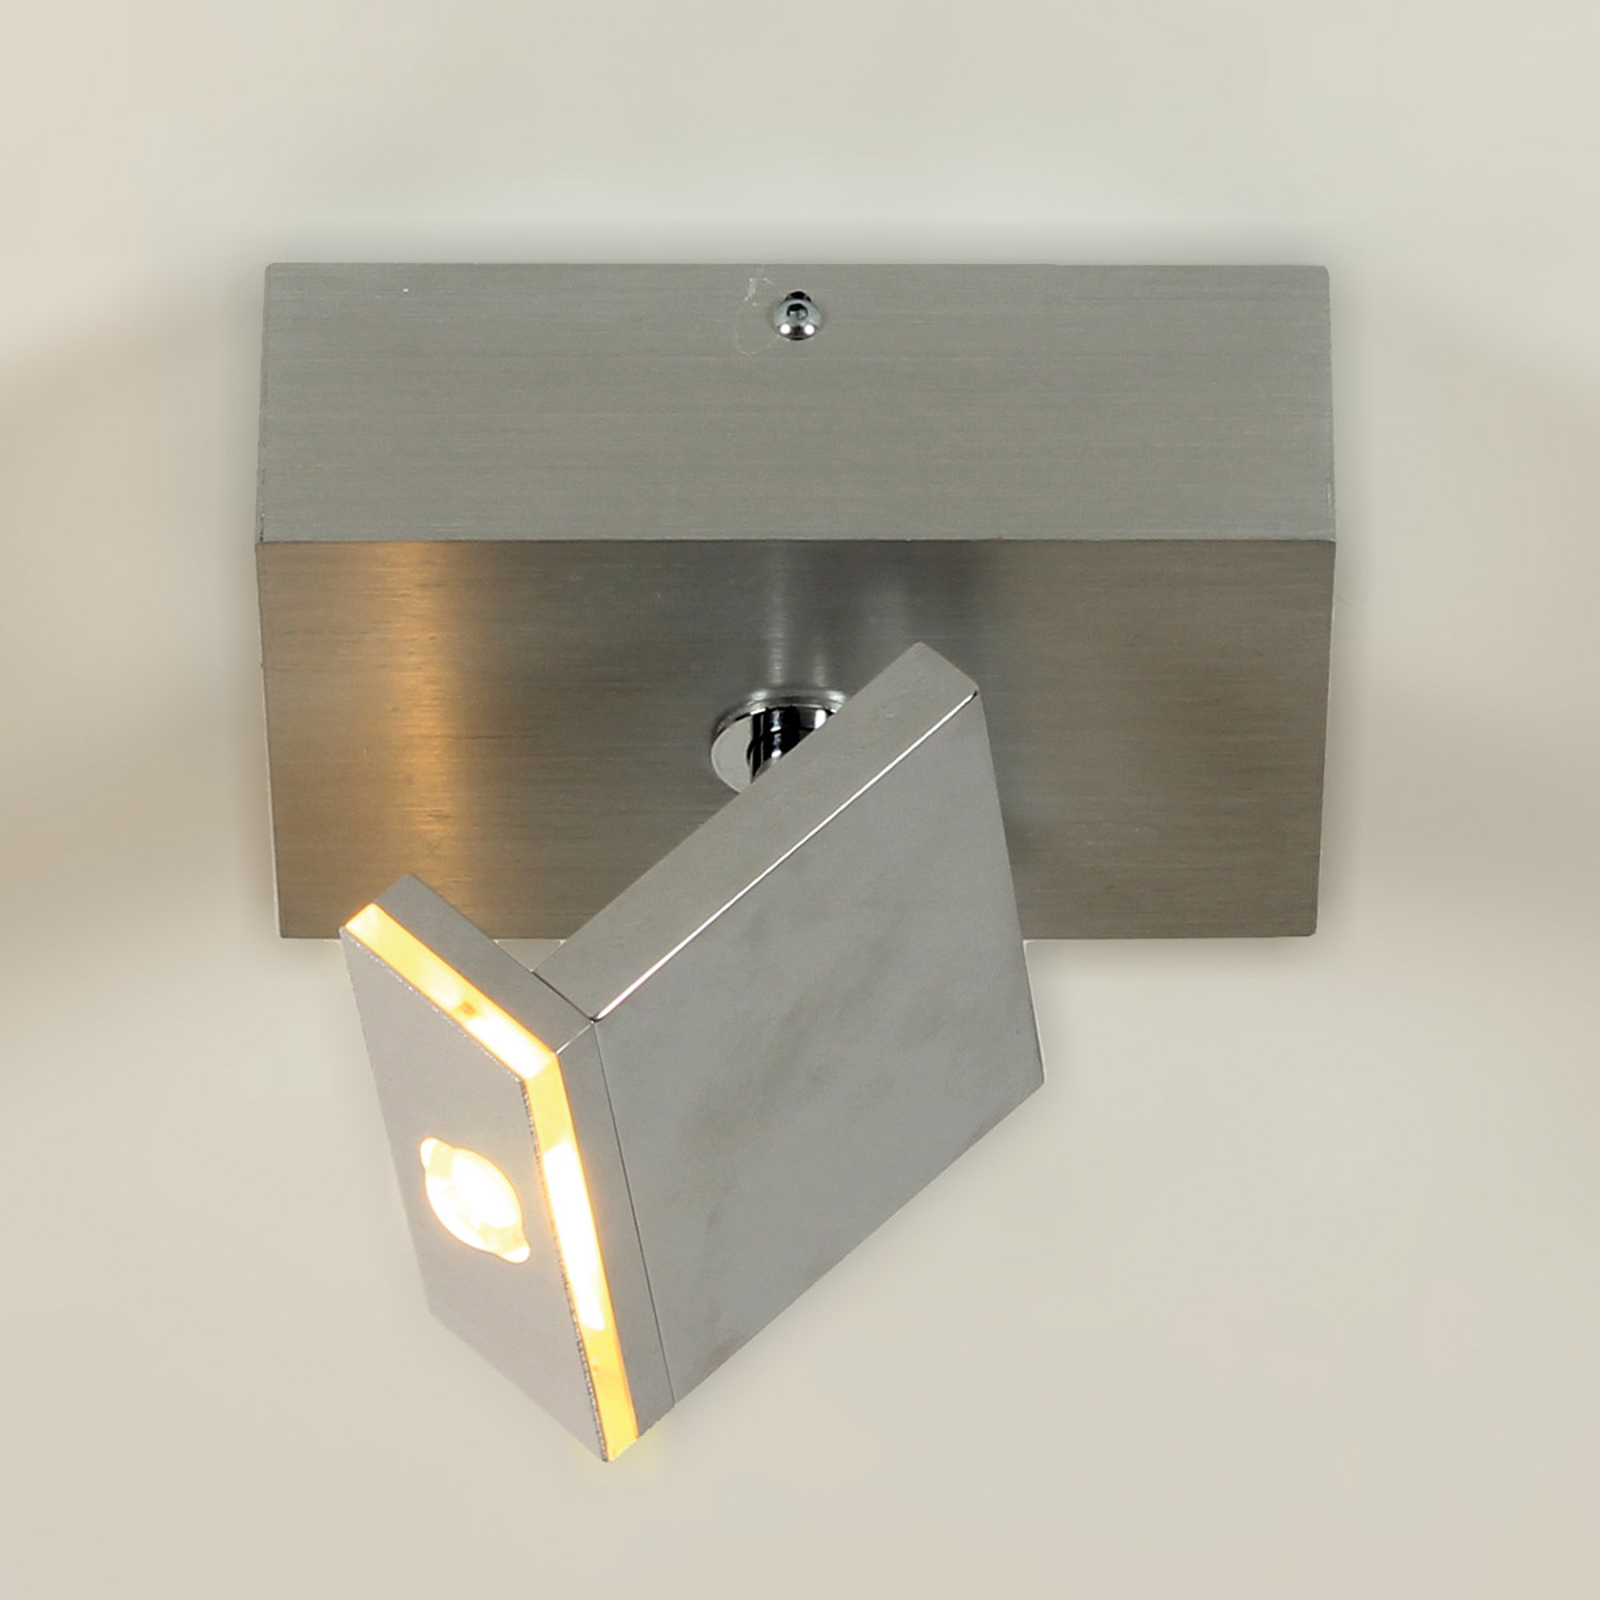 LED ceiling spotlight Elle, tiltable and dimmable_1556127_1